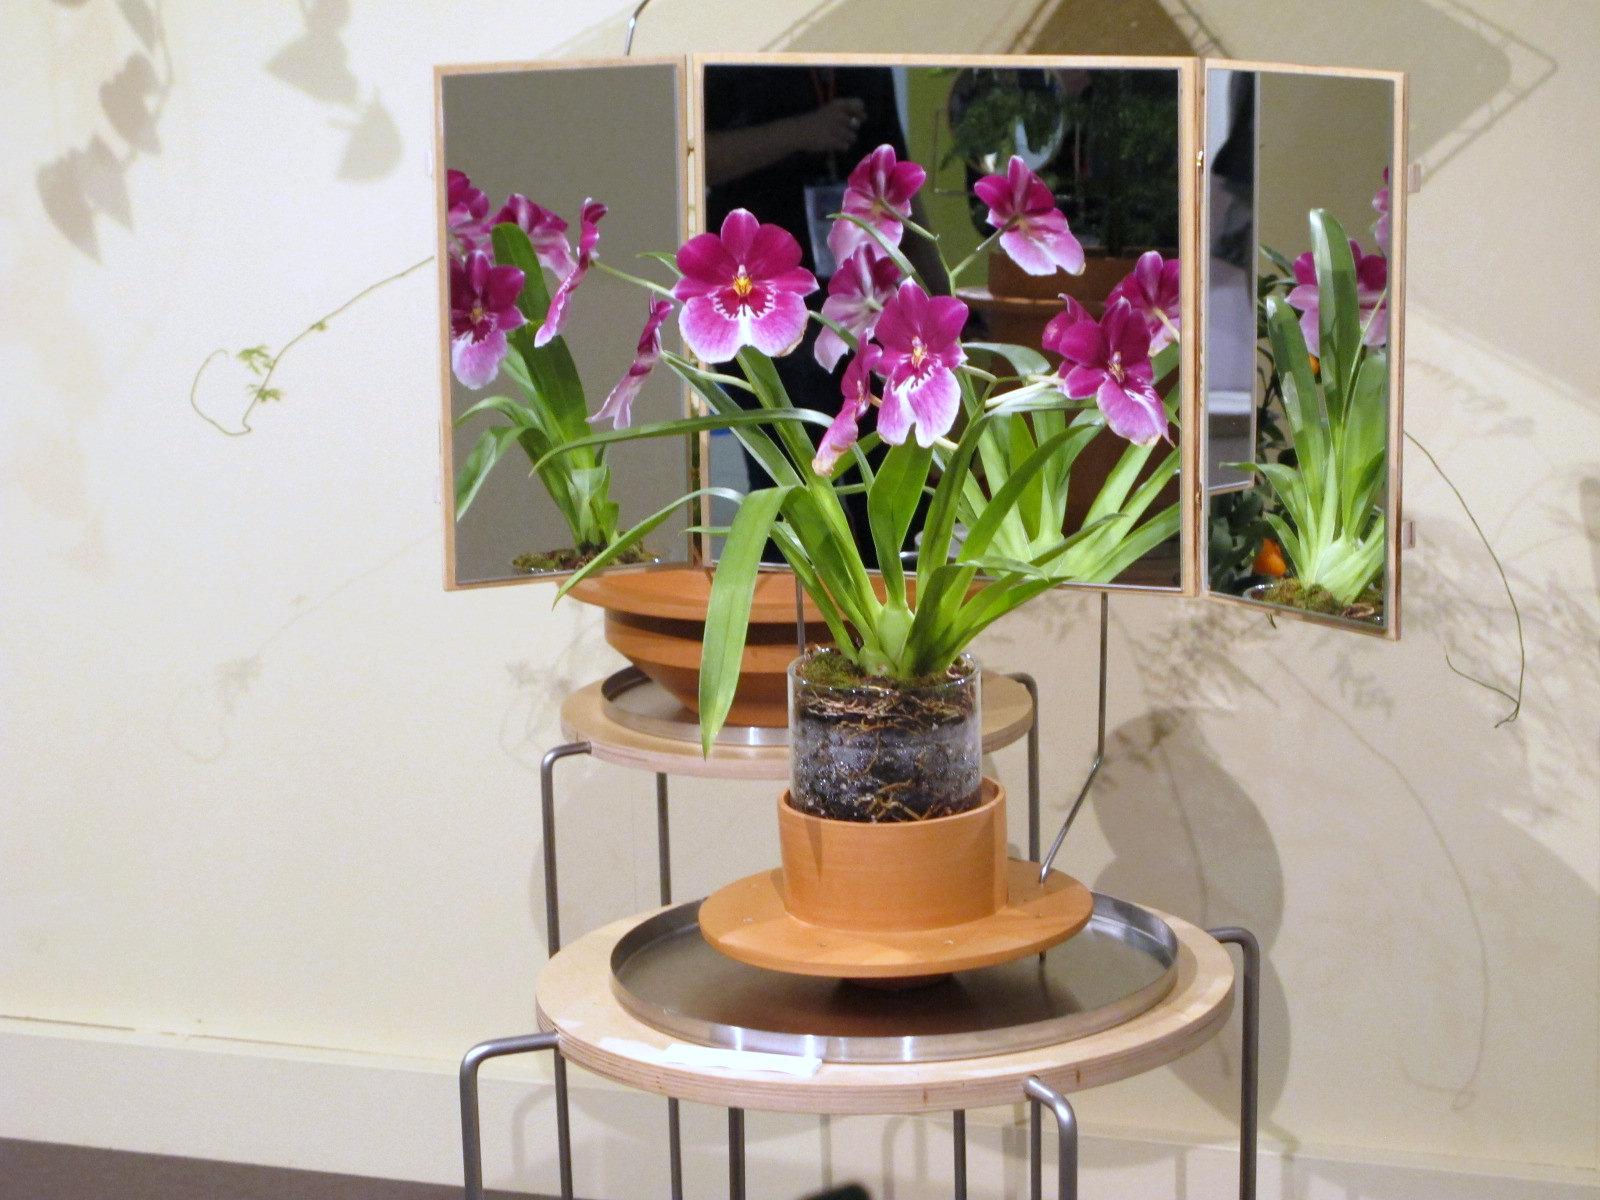 Dossofiorito, le design à fleur de pot!